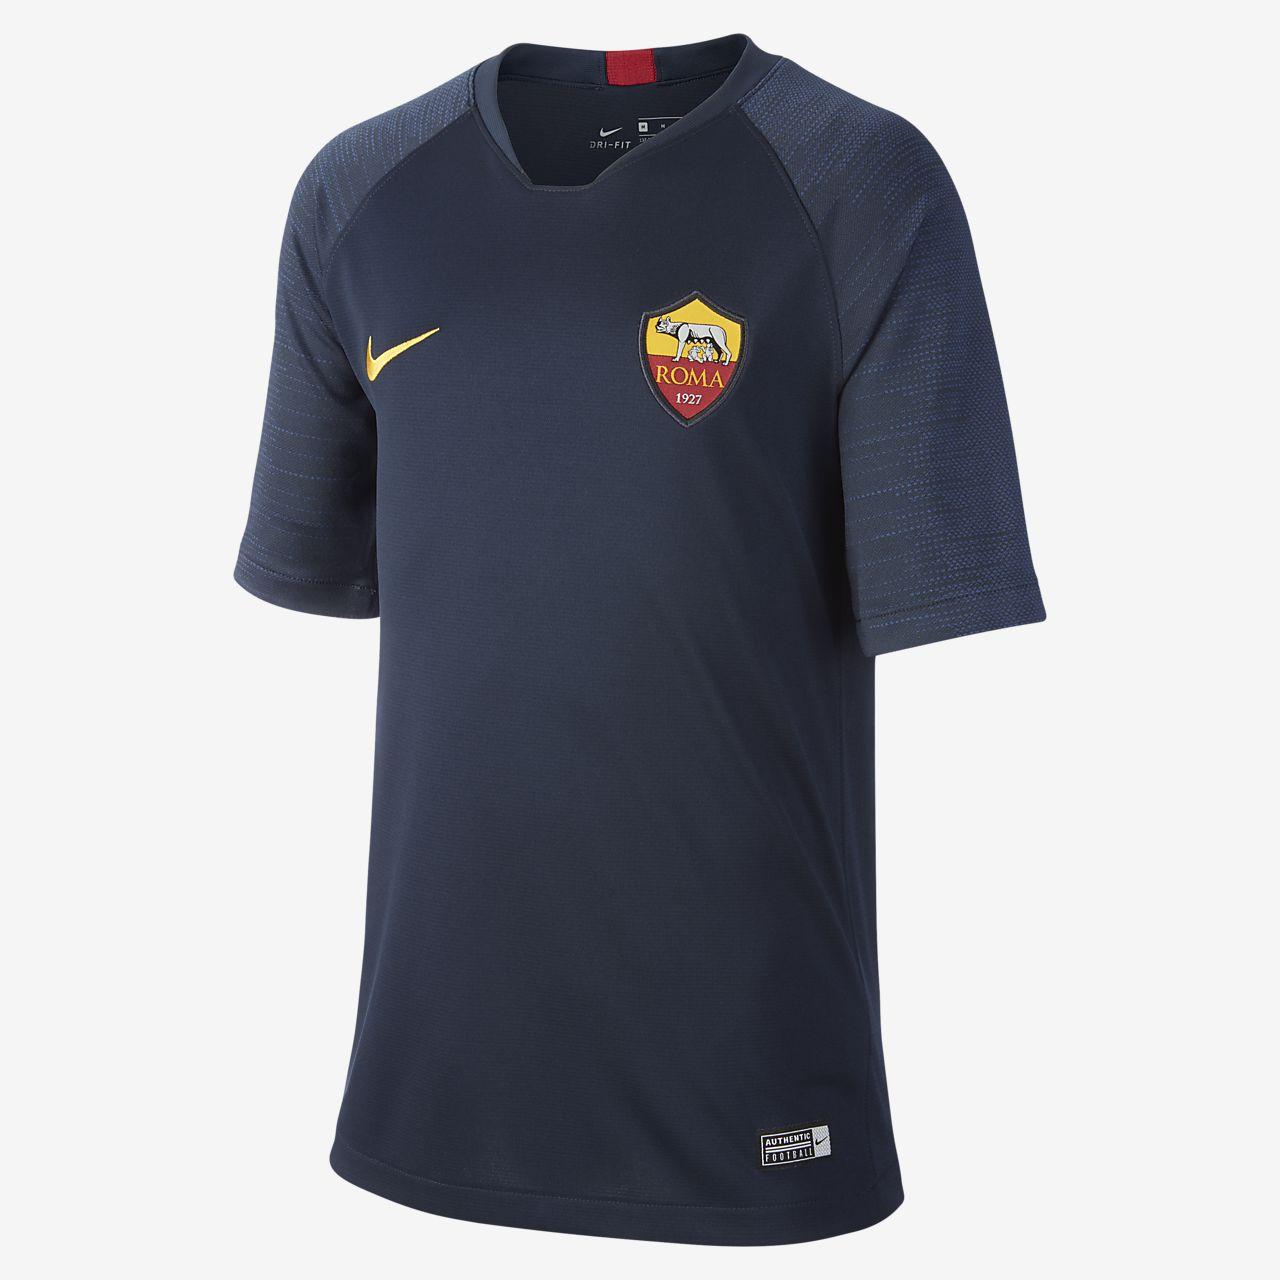 Nike Breathe A.S. Roma Strike Older Kids' Short-Sleeve Football Top